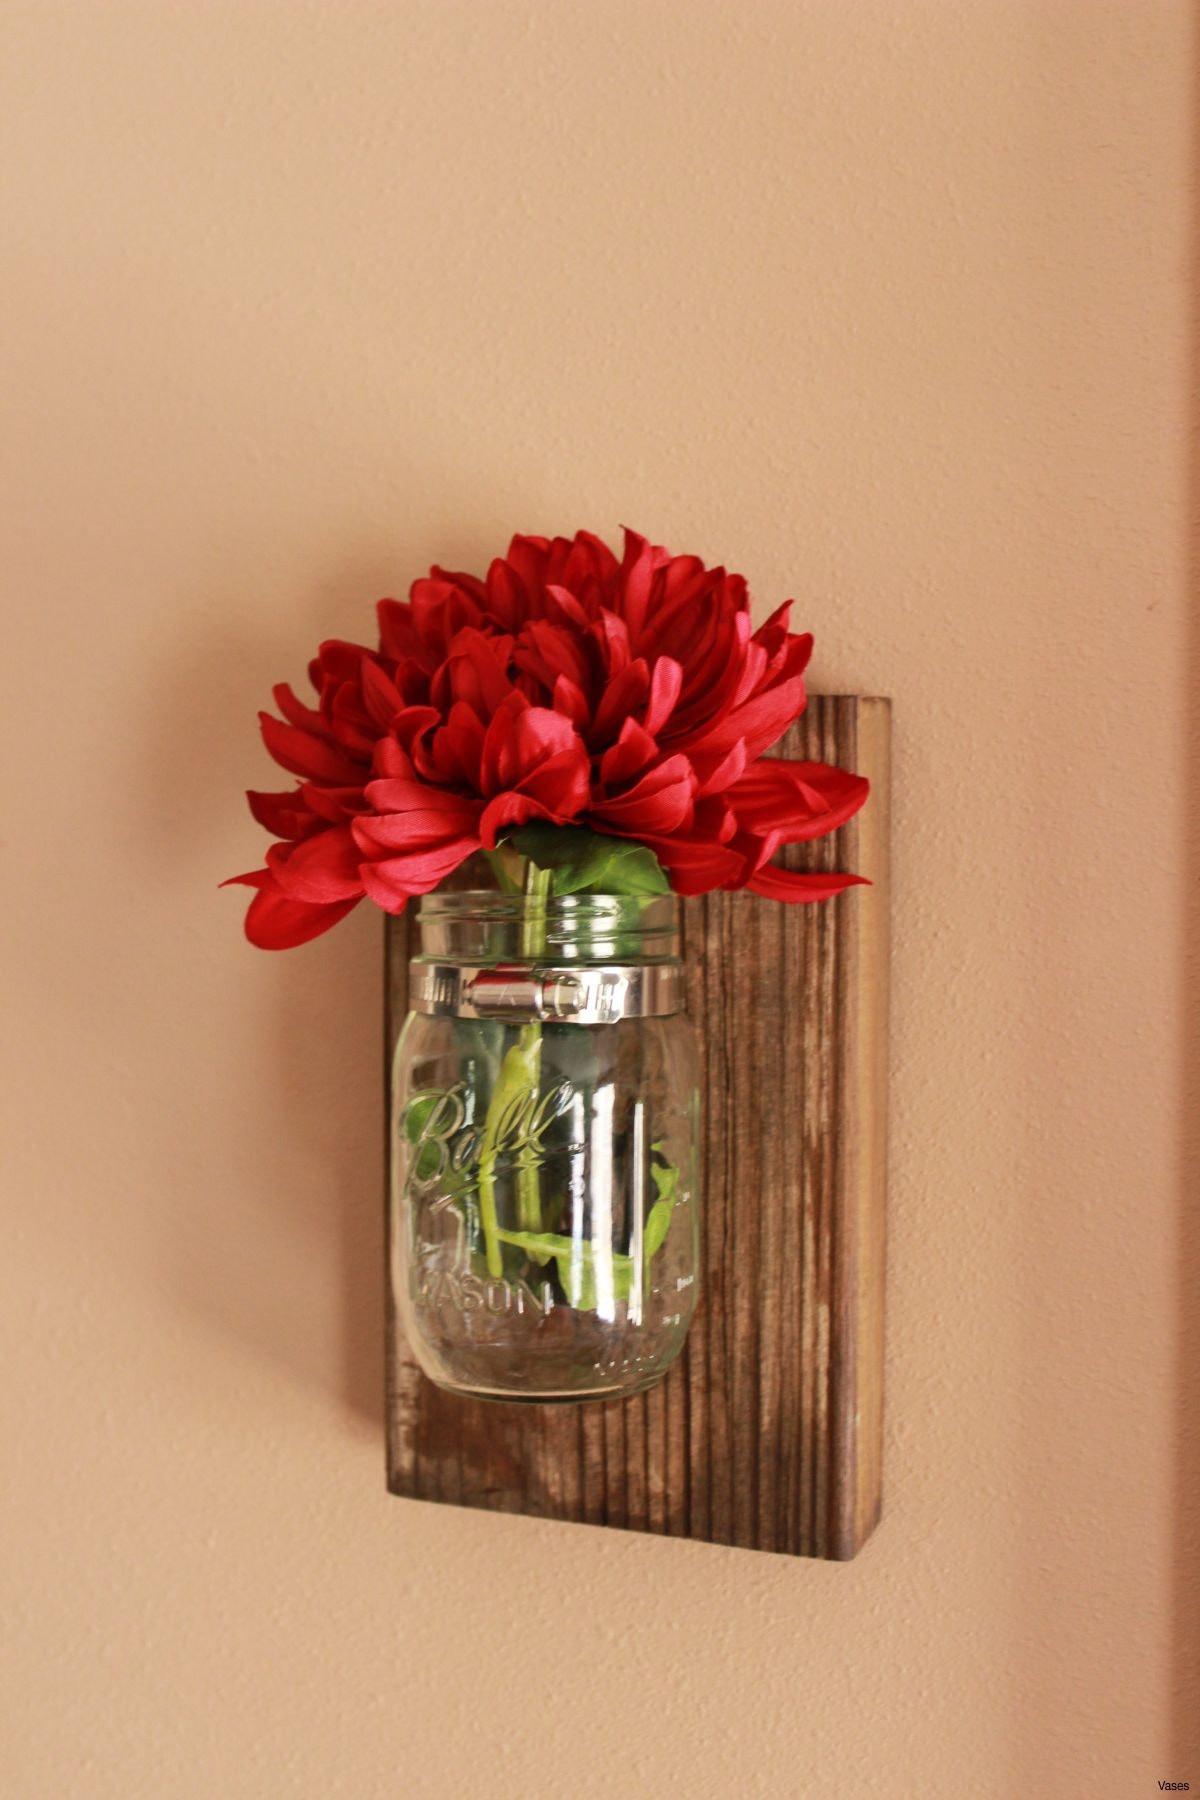 mason jar vases for wedding of flower wall decor meilleur de il fullxfull nny9h vases flower vase throughout flower wall decor meilleur de il fullxfull nny9h vases flower vase sconces zoomi 0d wall design